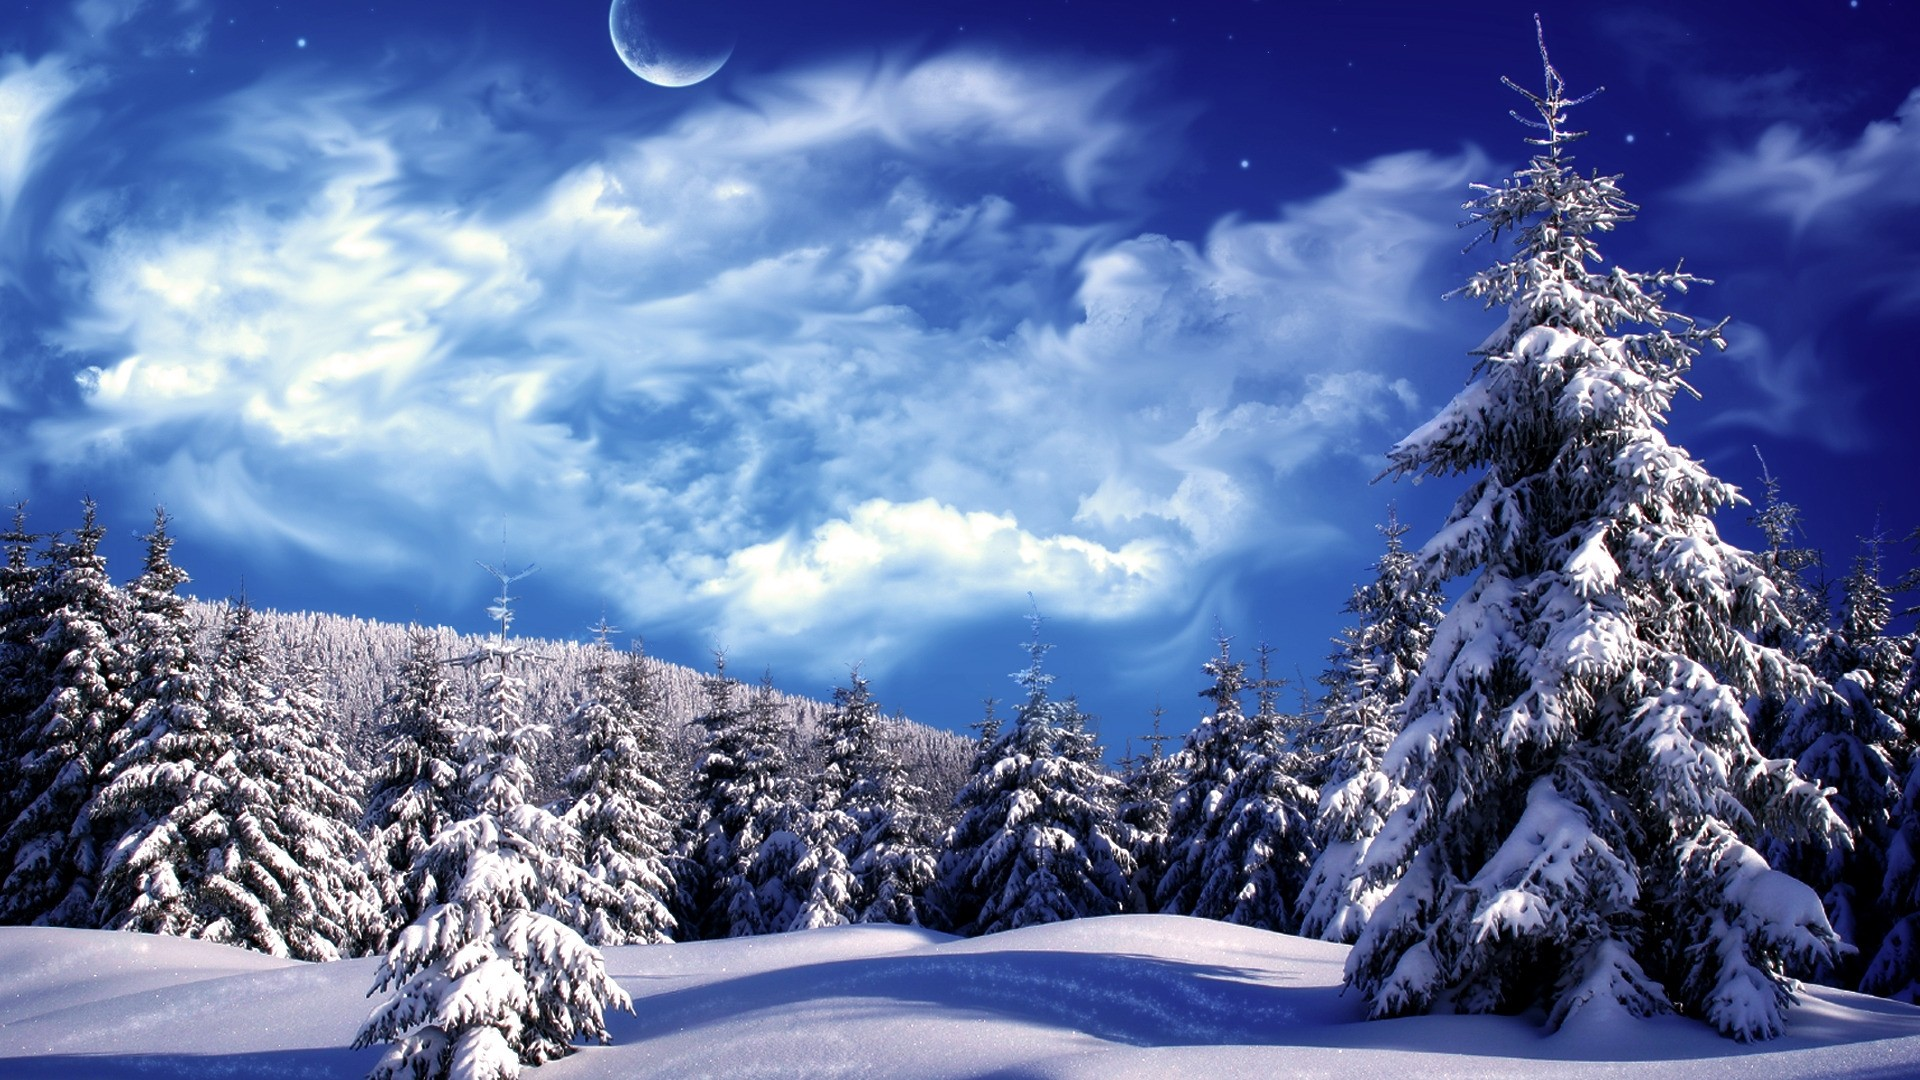 Winter Wonderland Free Wallpaper and Background